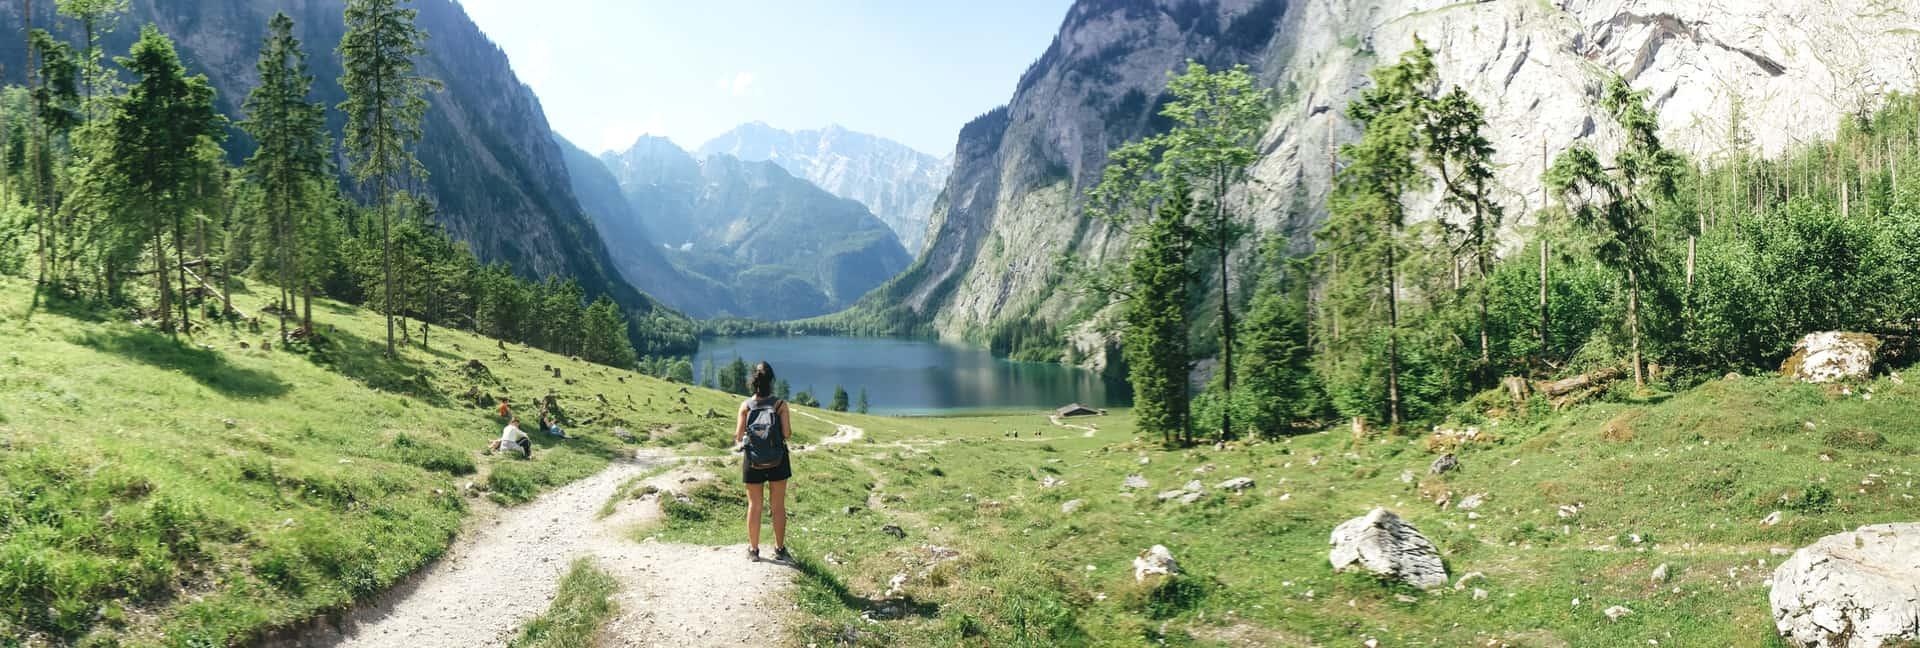 visitar lago obersee